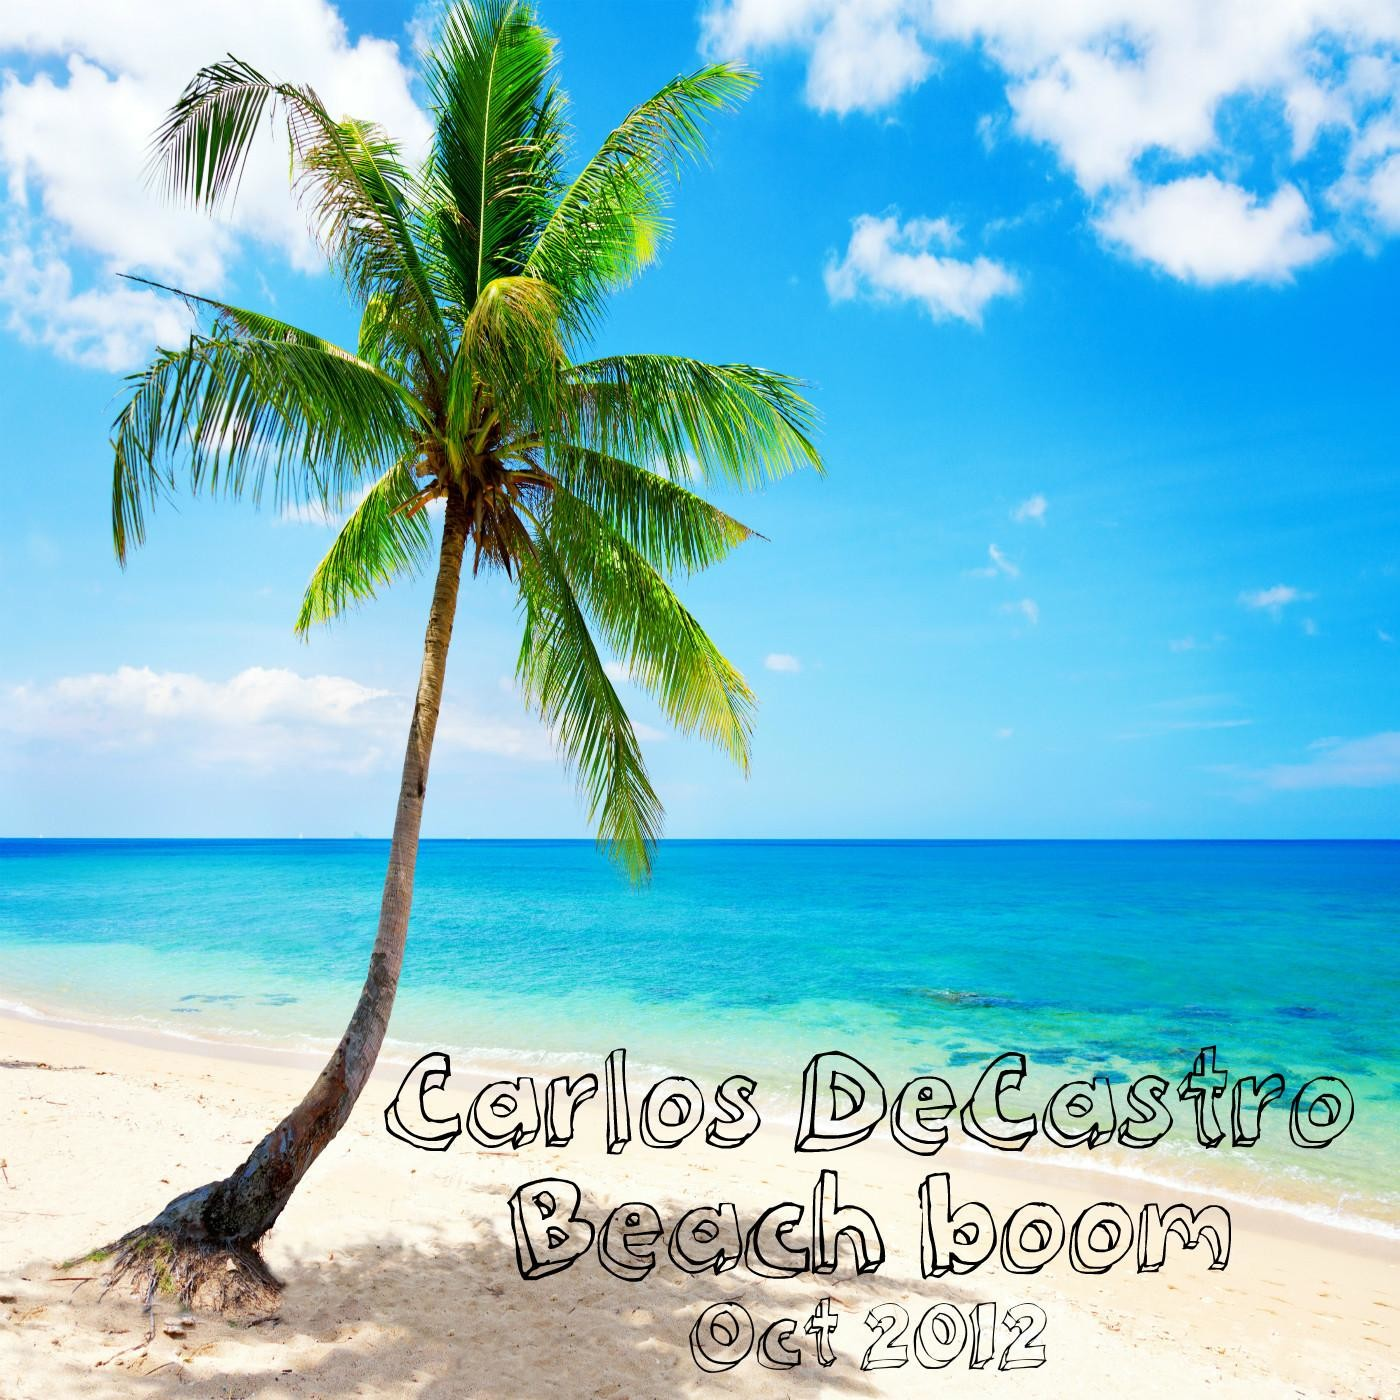 <![CDATA[Beach boom Oct 2012]]>